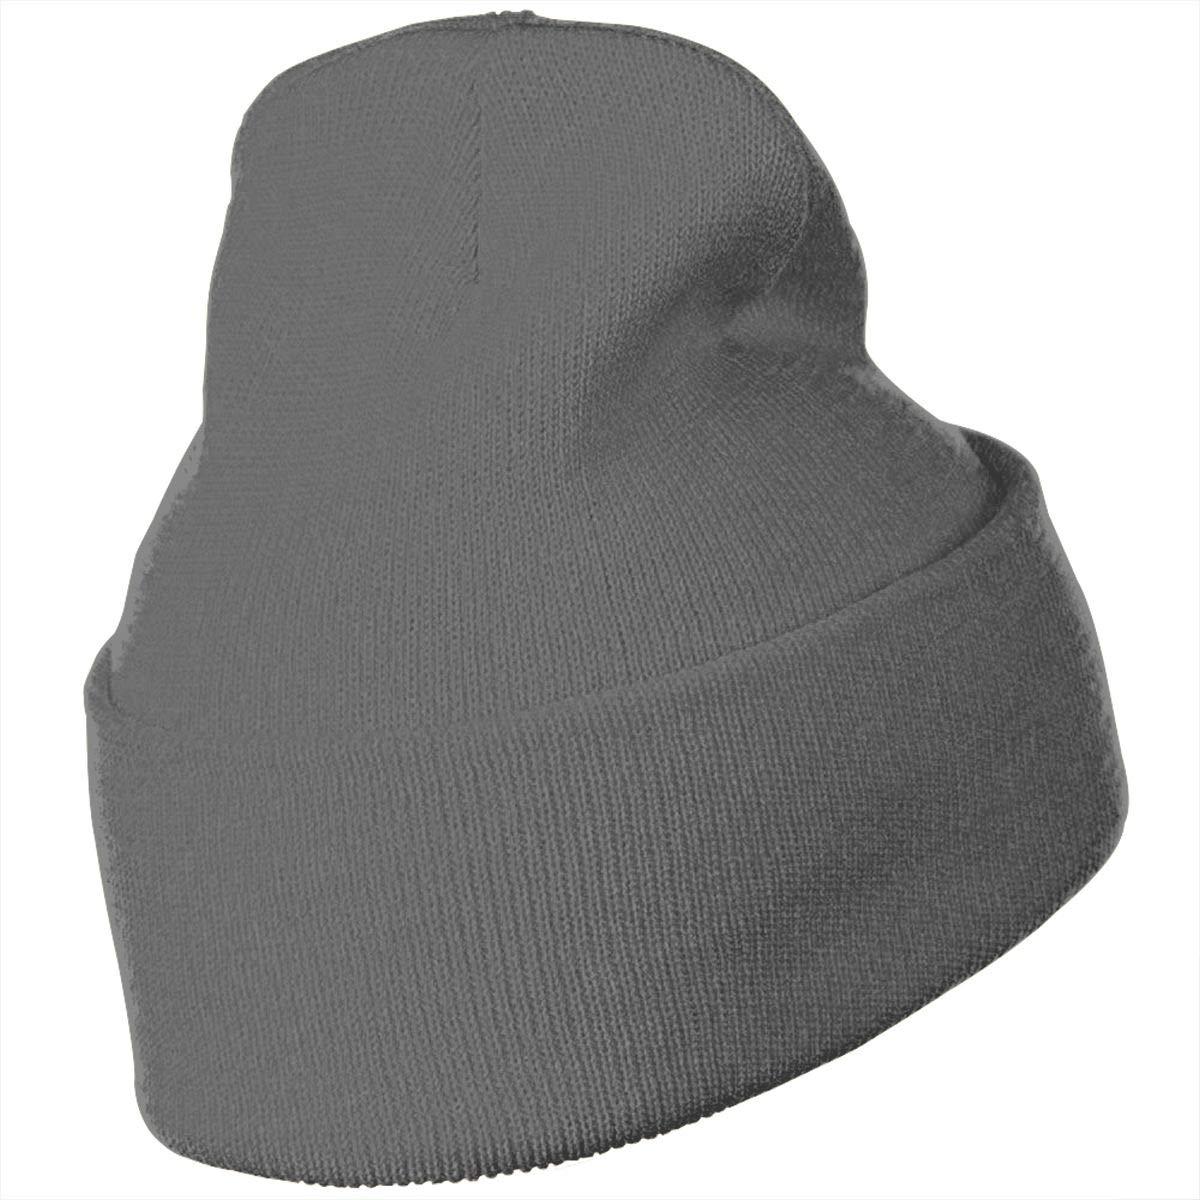 JINZ Lazarbeam 3D Printed Hat Knit Cap Casual Cap Cotton Cap